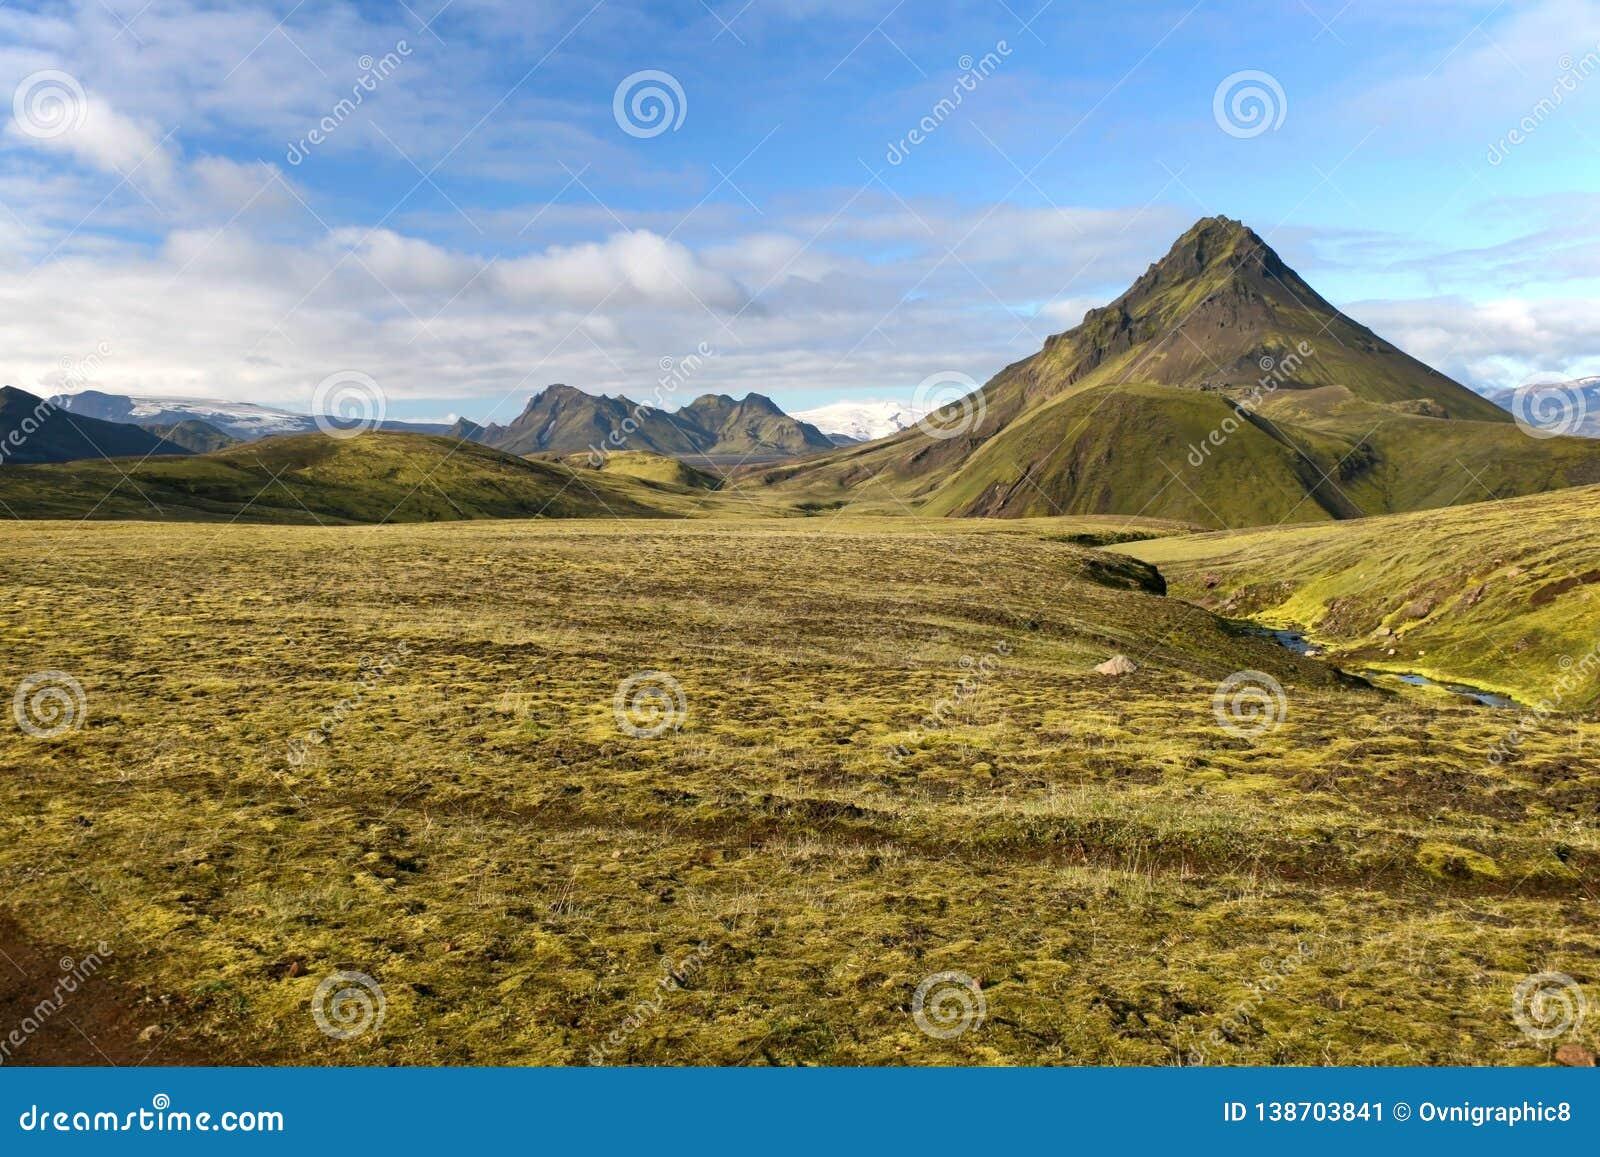 Montagna coperta da muschio verde nel parco nazionale di Landmannalaugar, Islanda